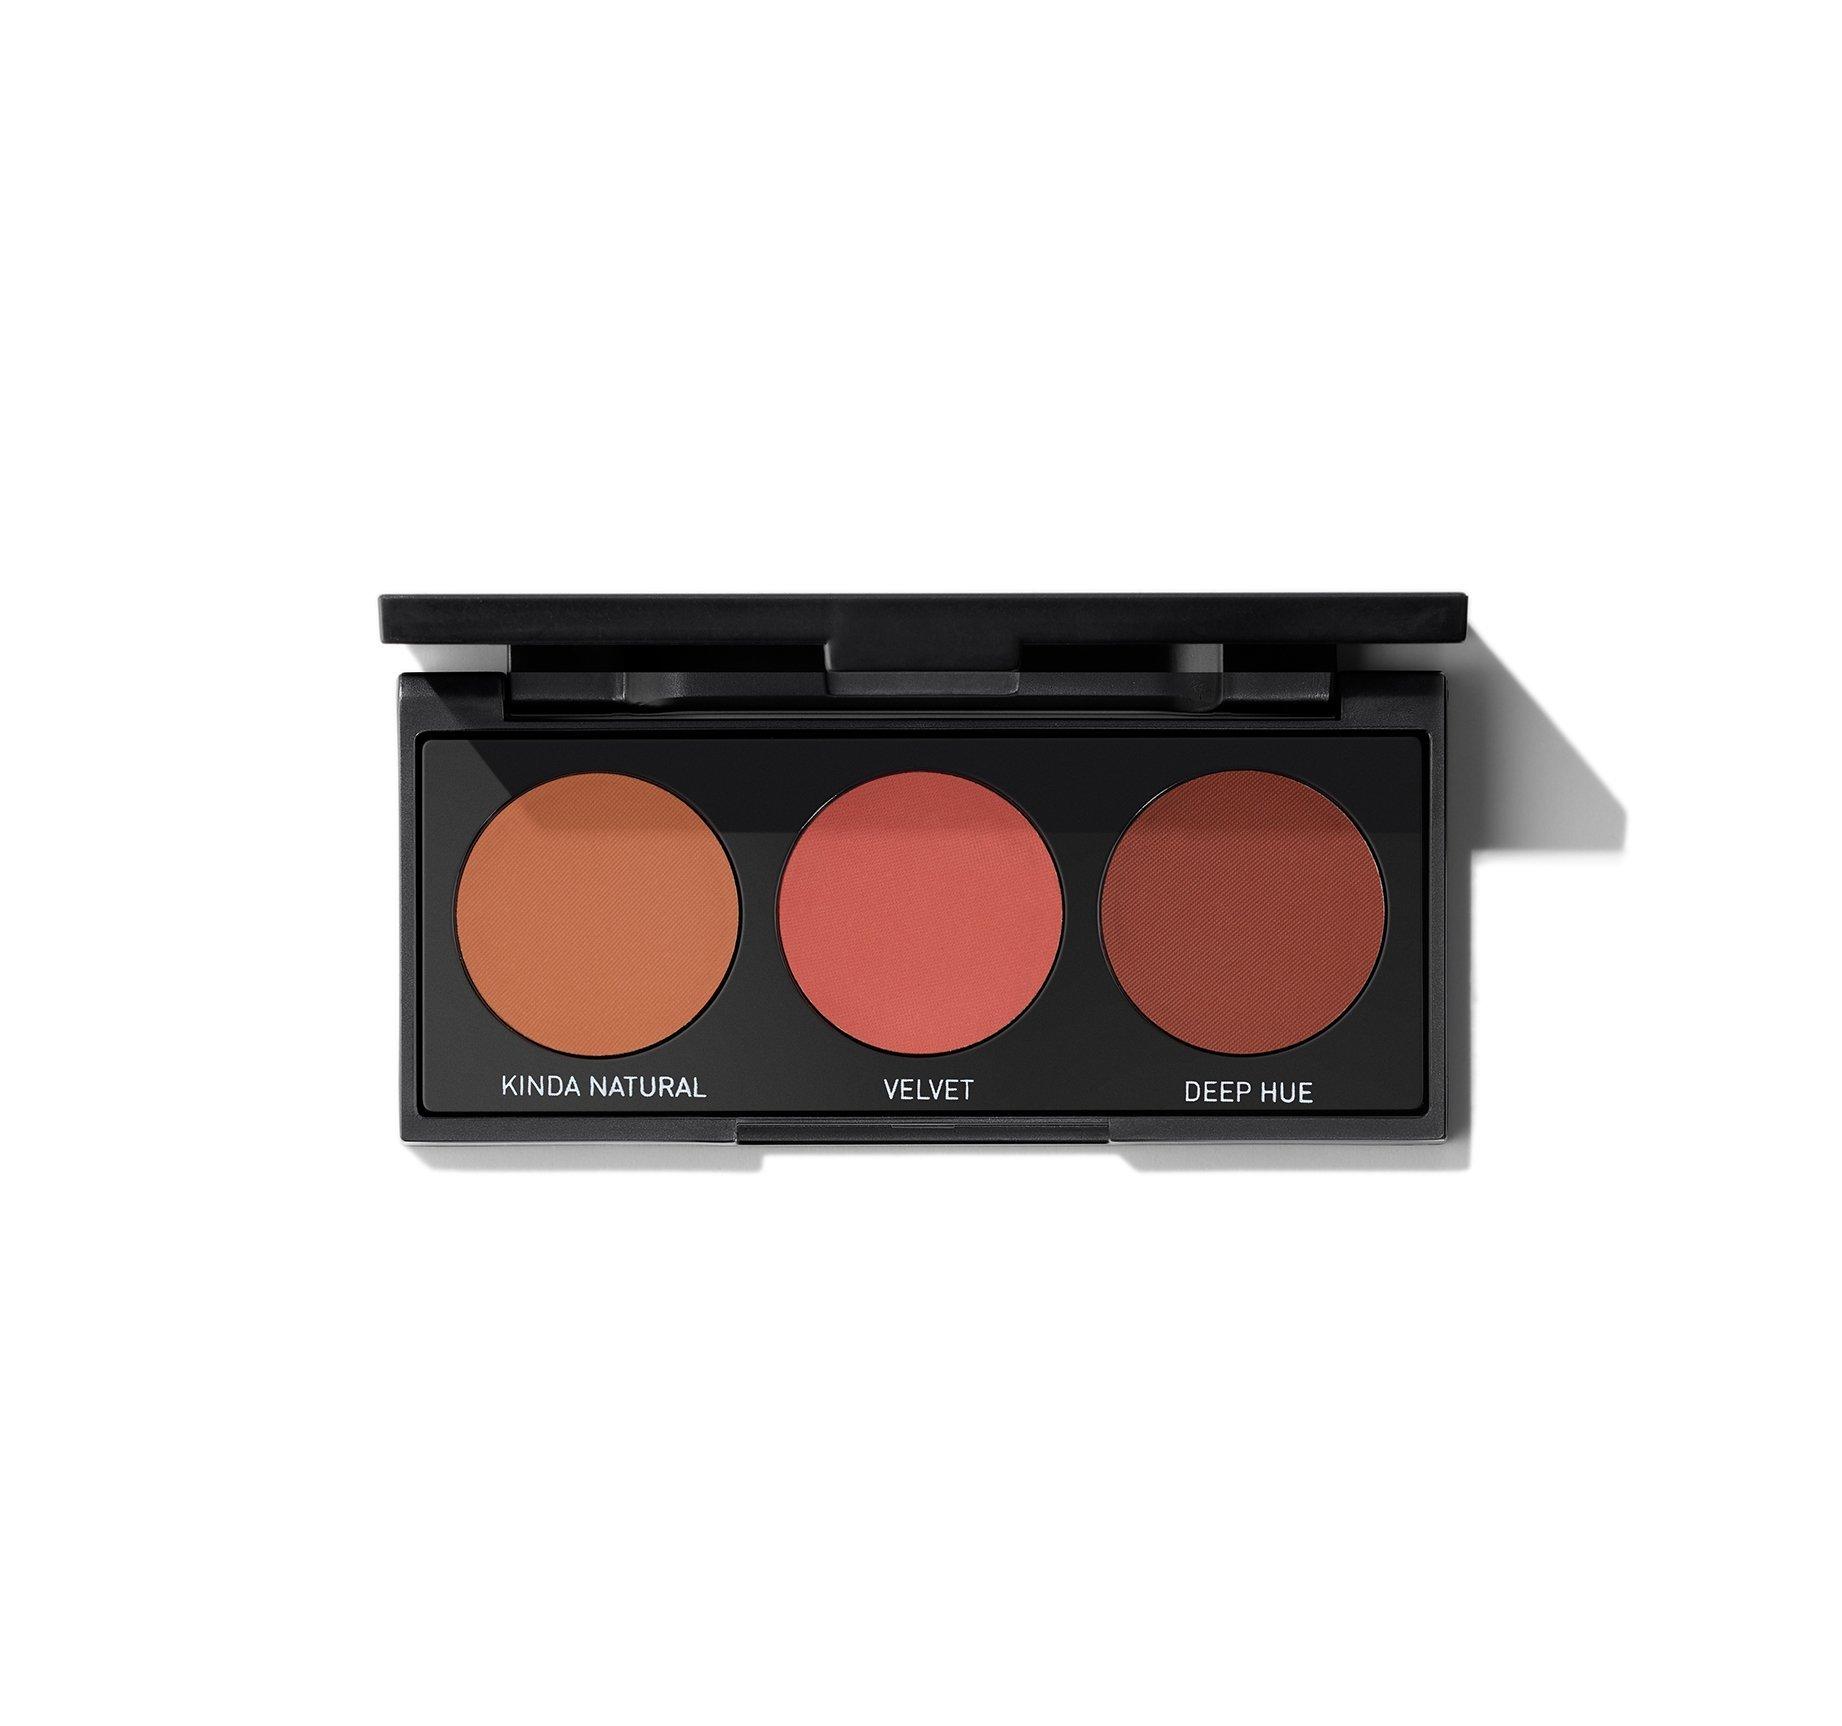 MORPHE 3B Pure Nude Eyeshadow Palette Reviews 2021